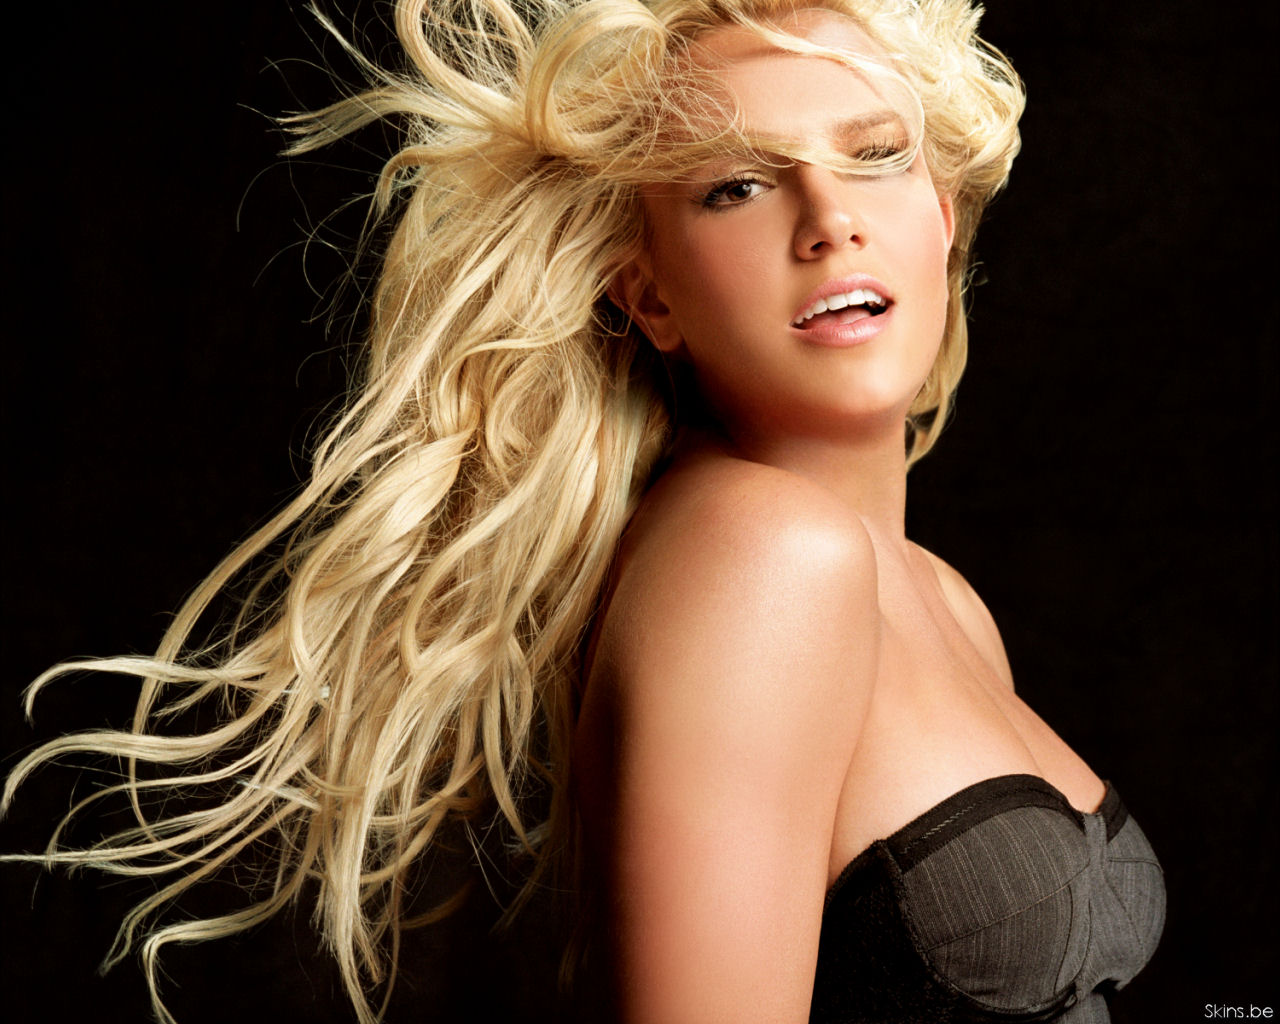 http://3.bp.blogspot.com/-gkEoXXnD8Hg/T_5dVkf3oLI/AAAAAAAAHZA/tpovRRkb6mk/s1600/Hot-Britney+Spears+(18).jpg